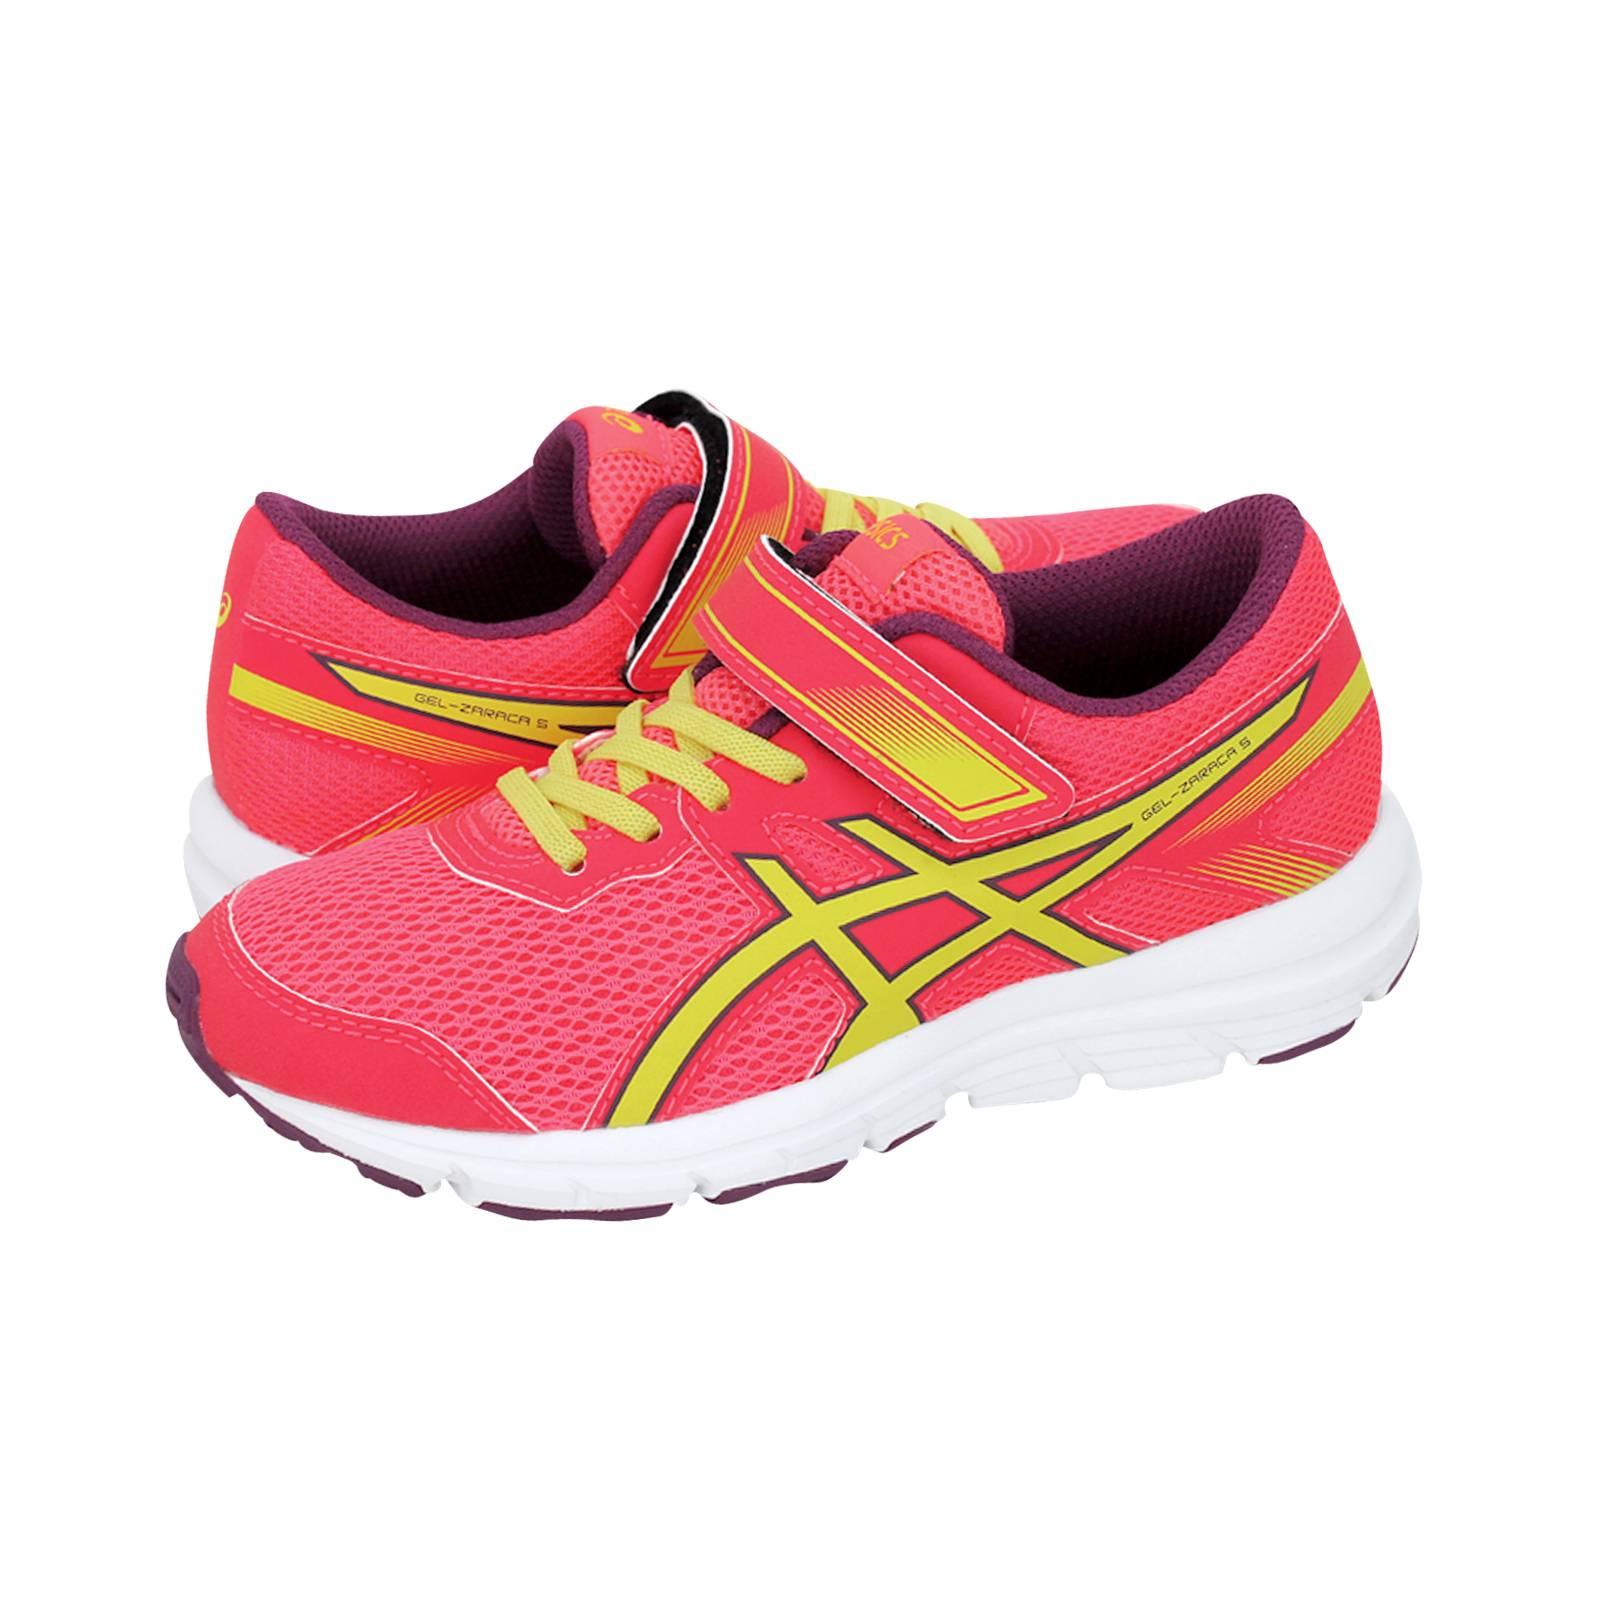 9c7d594ed46 Gel-Zaraca 5 PS - Παιδικά αθλητικά παπούτσια Asics από υφασμα και ...